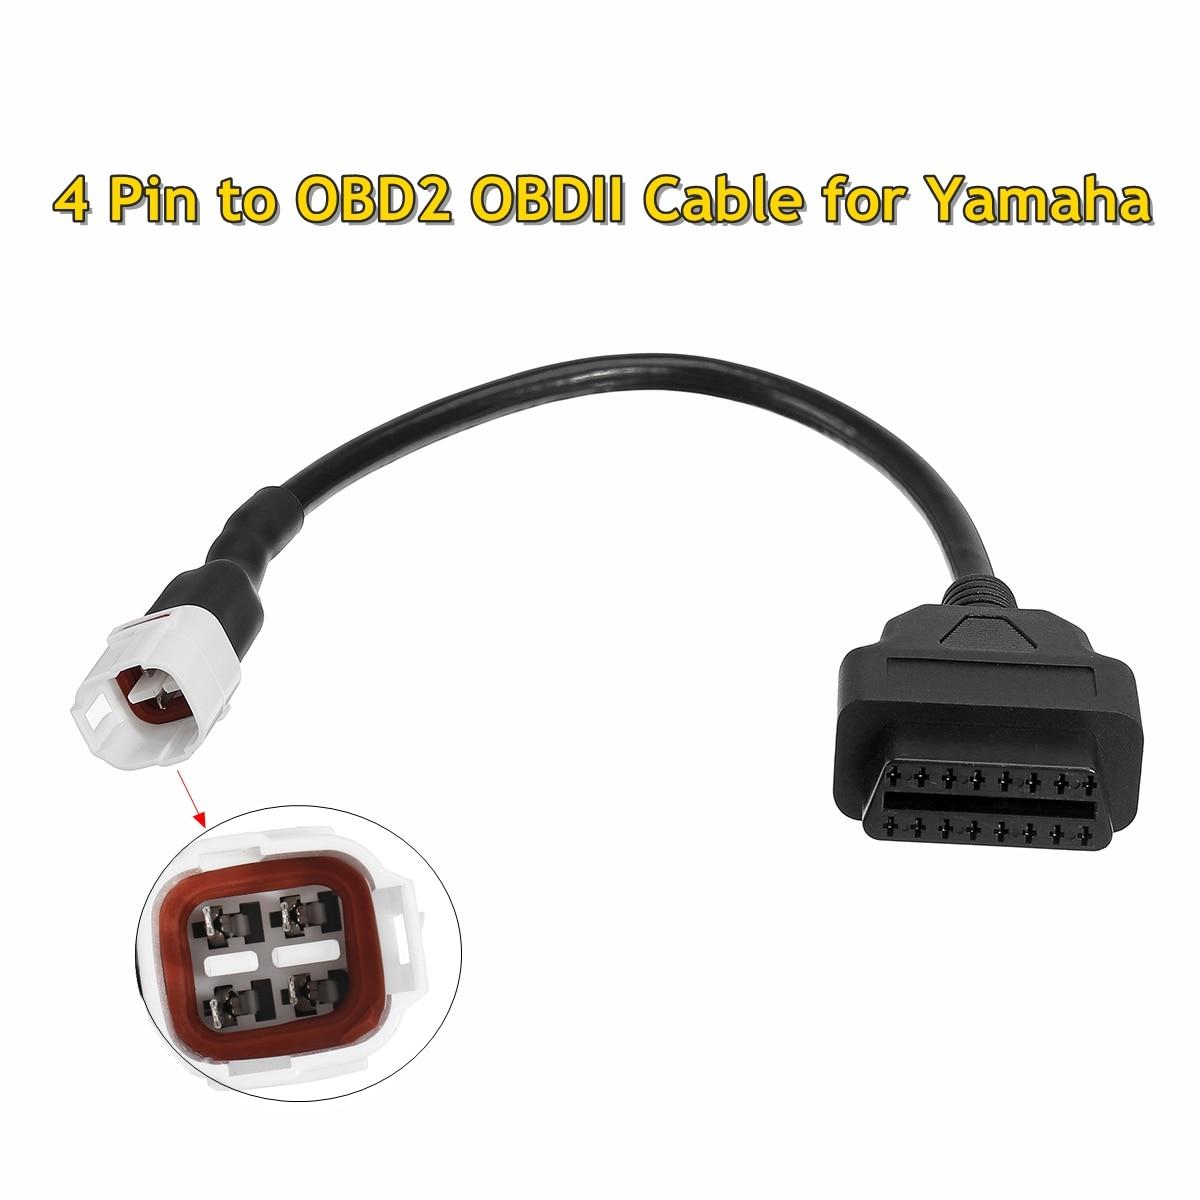 Nuevo adaptador de arnés de Cable OBD2 OBDII de 4 pines de diagnóstico para Yamaha FJ09, FZ09, MT09, FZ-10, MT-10, XSR900, R6, R1, 900/GT ETC. Coche Mini portátil ELM327 V2.1 OBD2 II Bluetooth diagnóstico coche Auto interfaz escáner azul Premium ABS herramienta de diagnóstico